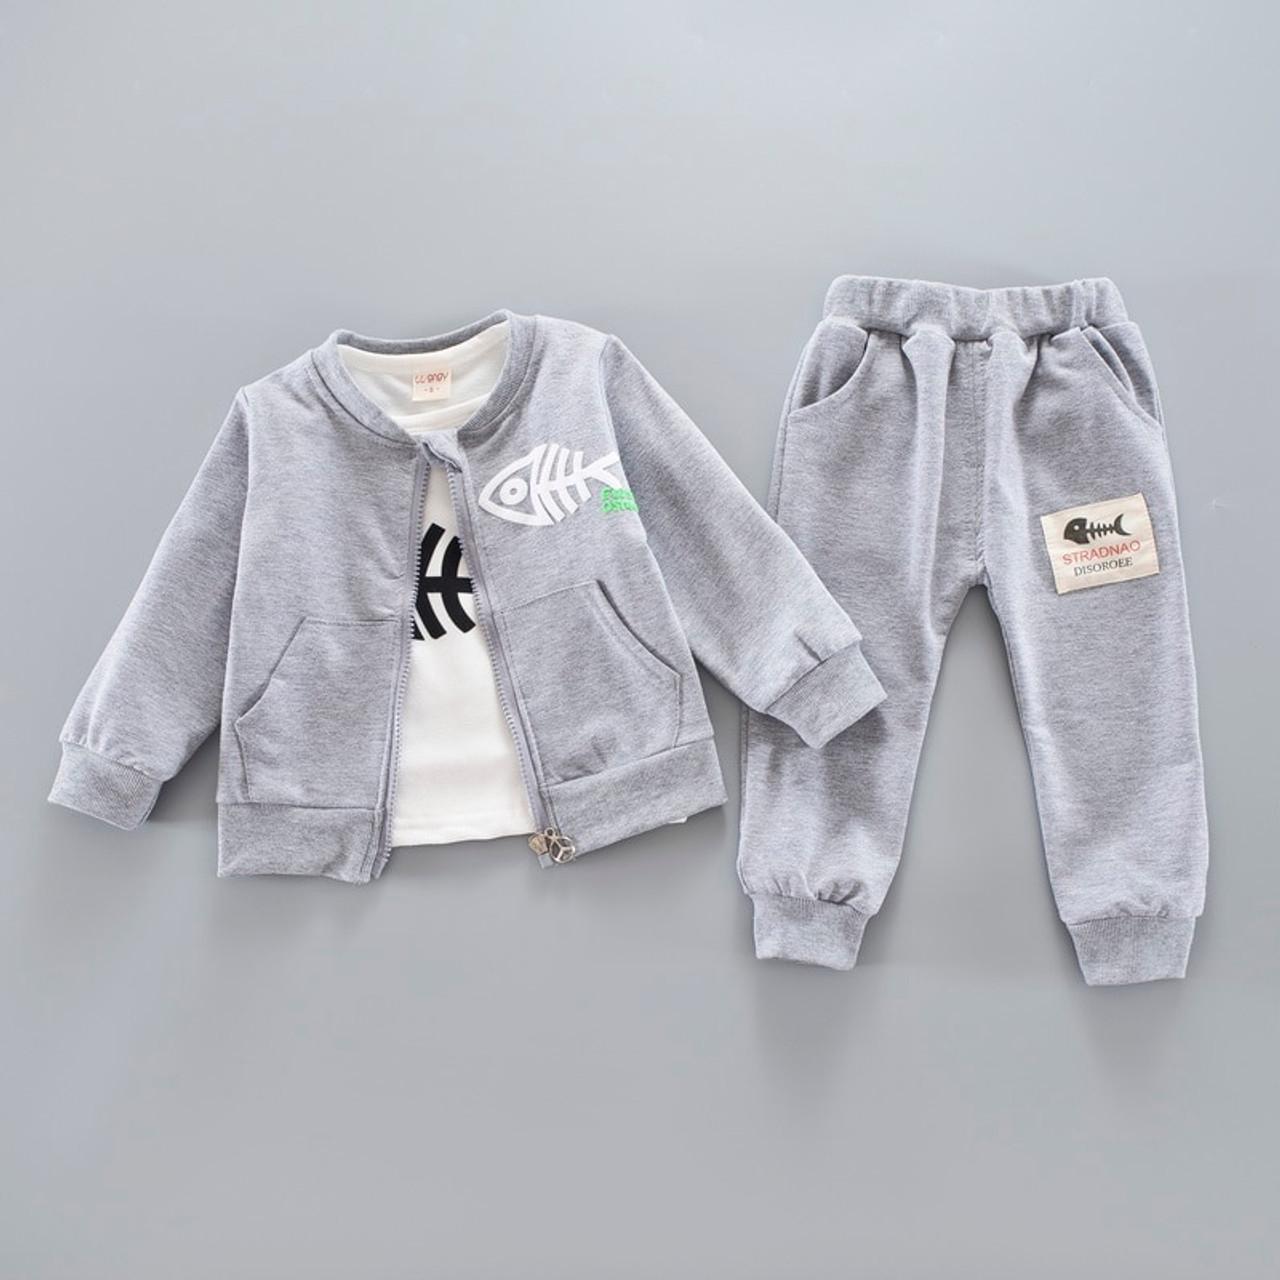 0d51d6c1c Bibicola baby boys clothing set toddler bebe coat jacket+ T shirt+ ...